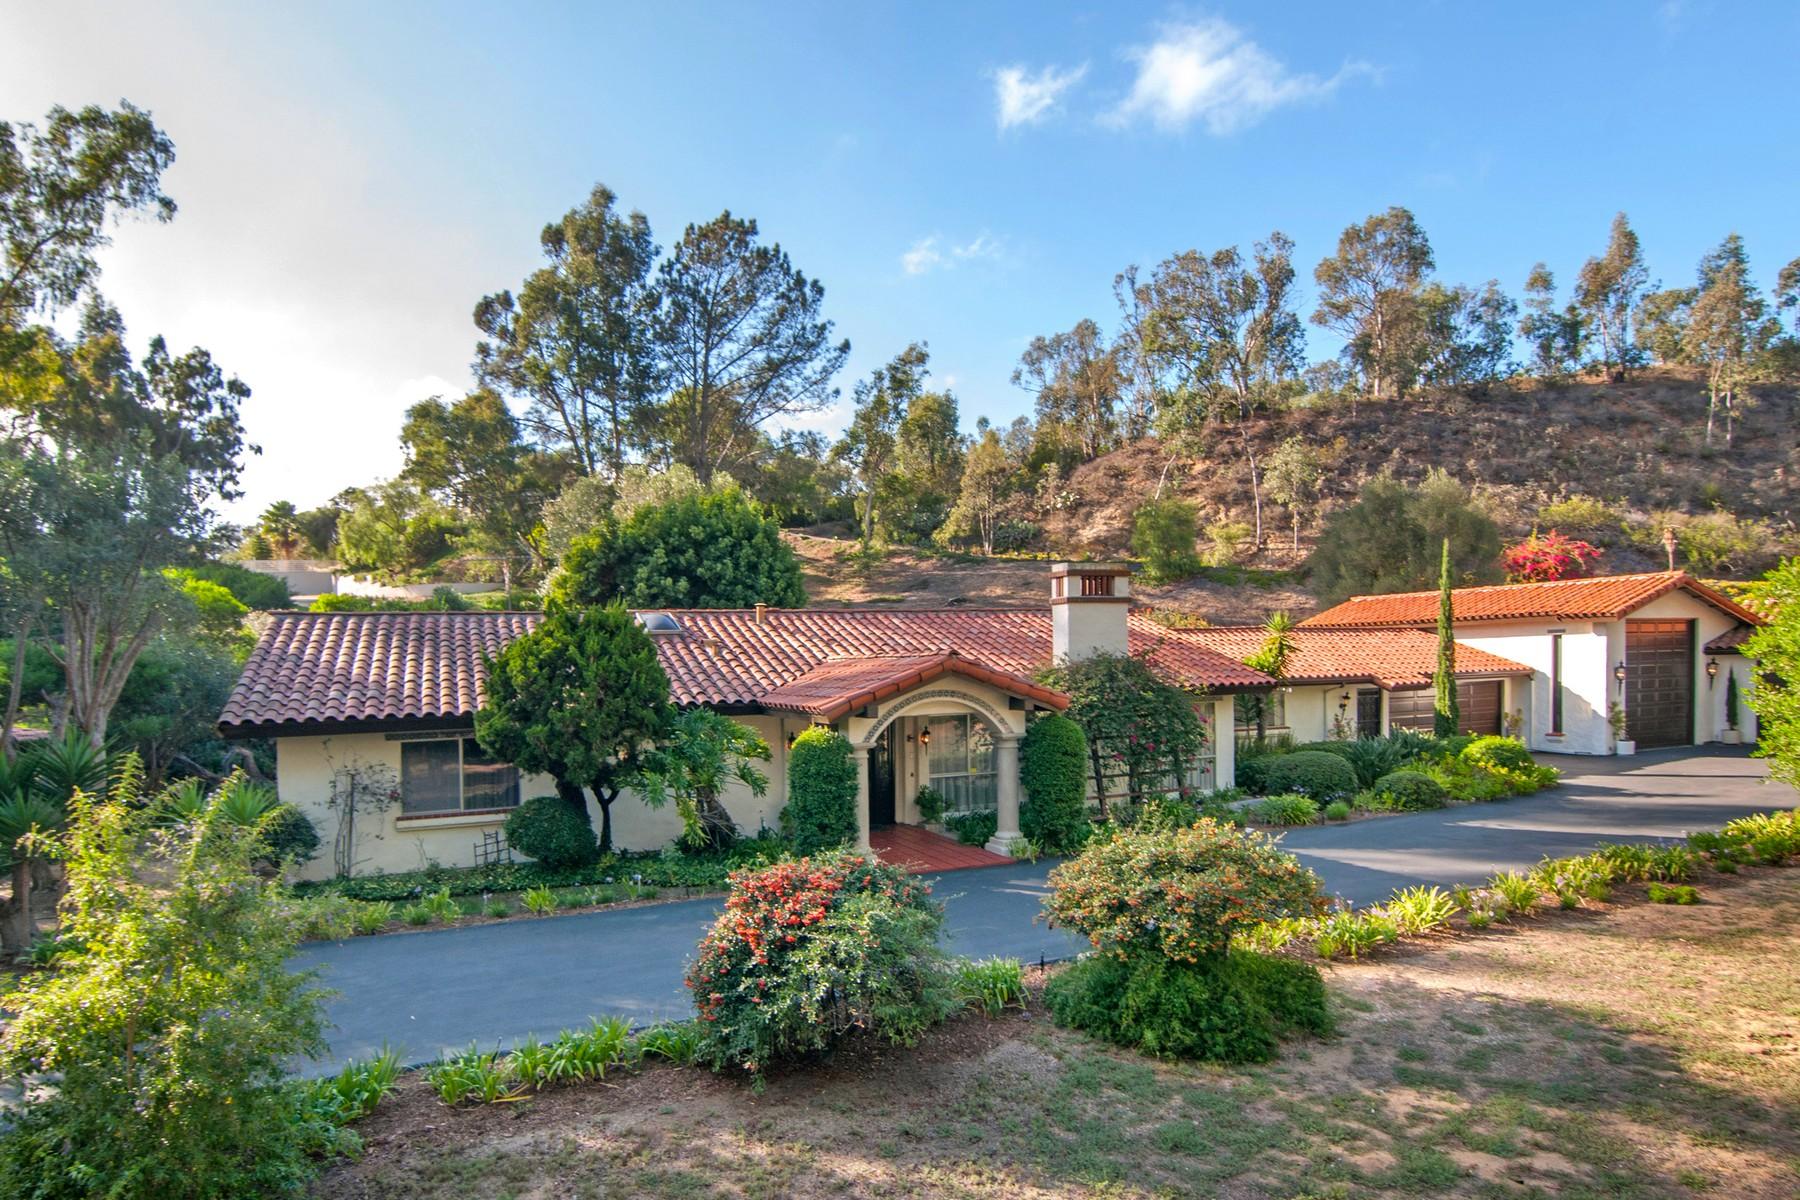 Single Family Home for Sale at 15130 El Camino Real Rancho Santa Fe, California, 92067 United States